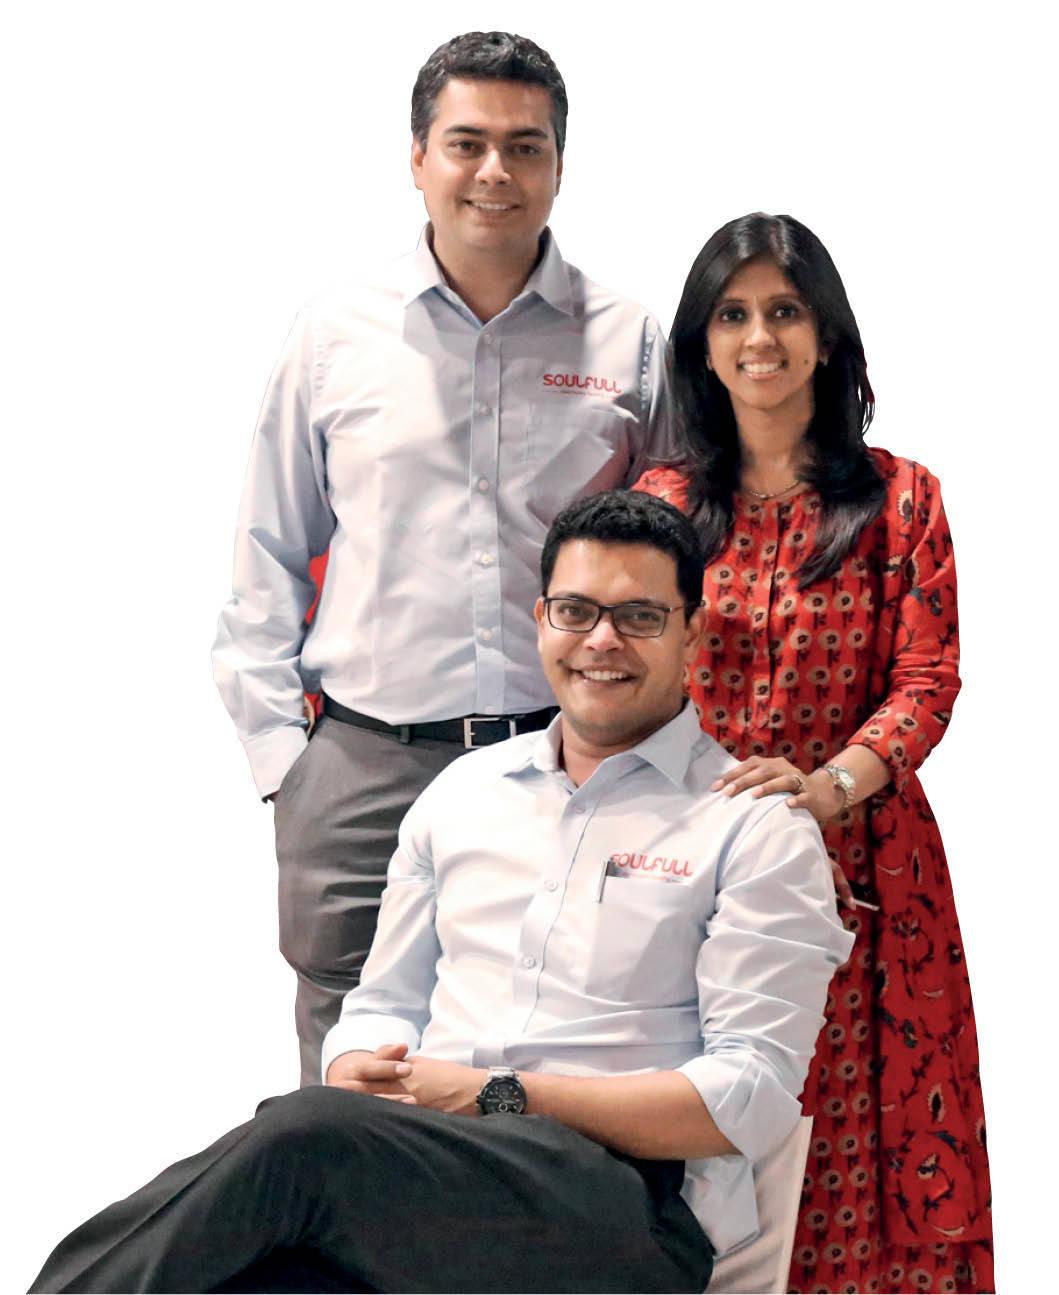 Soulfull's founders: Amith Sebastian, Rasika Iyer, and Prashant Parameswaran